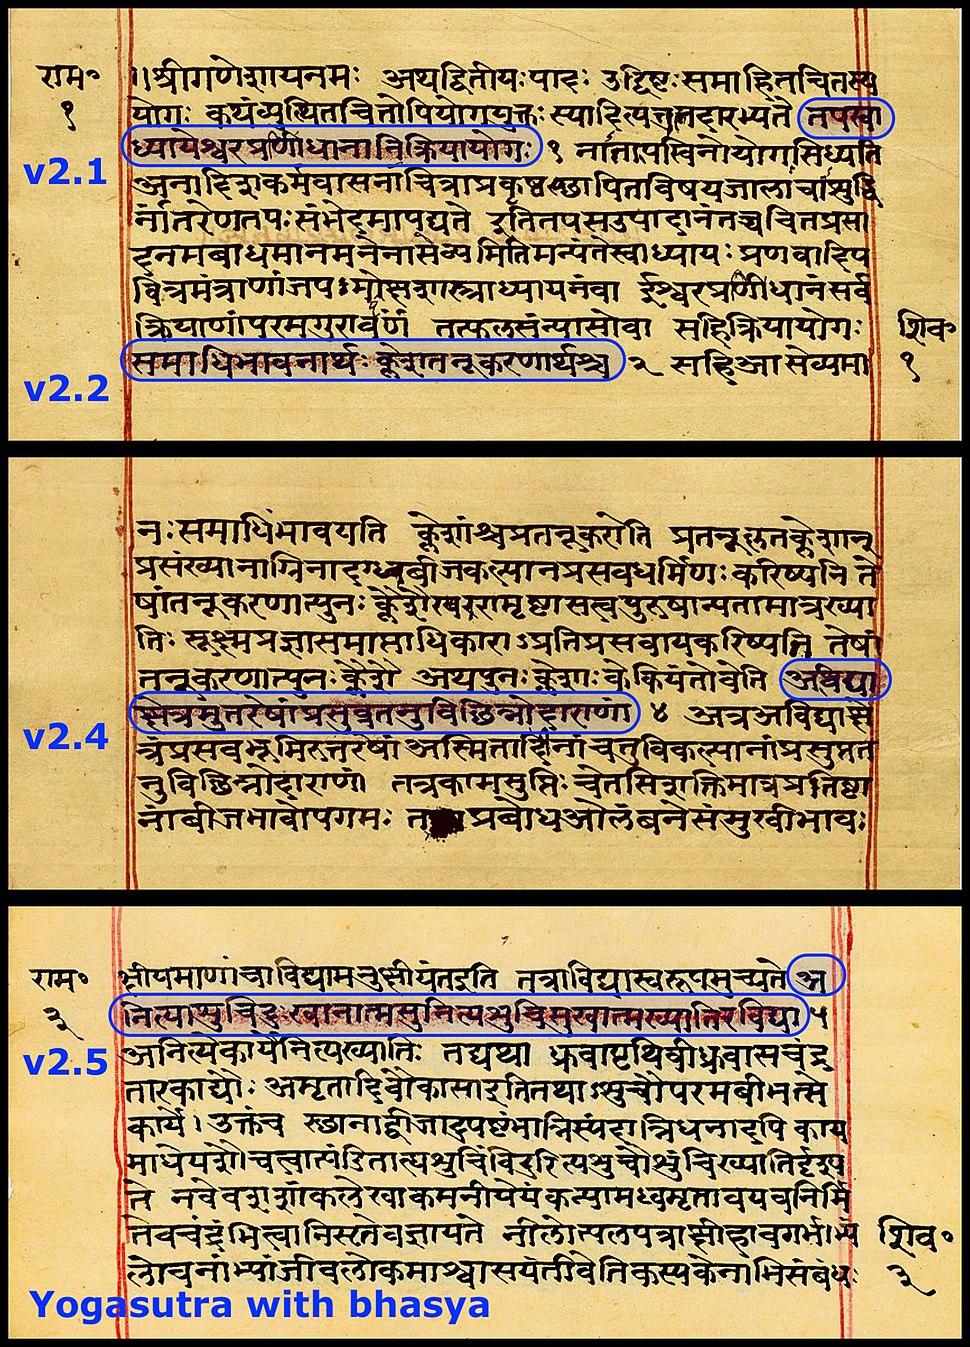 Yogasutra with Patanjali's bhasya, Sanskrit, Devanagari script, random sample pages f1v f2r f3v